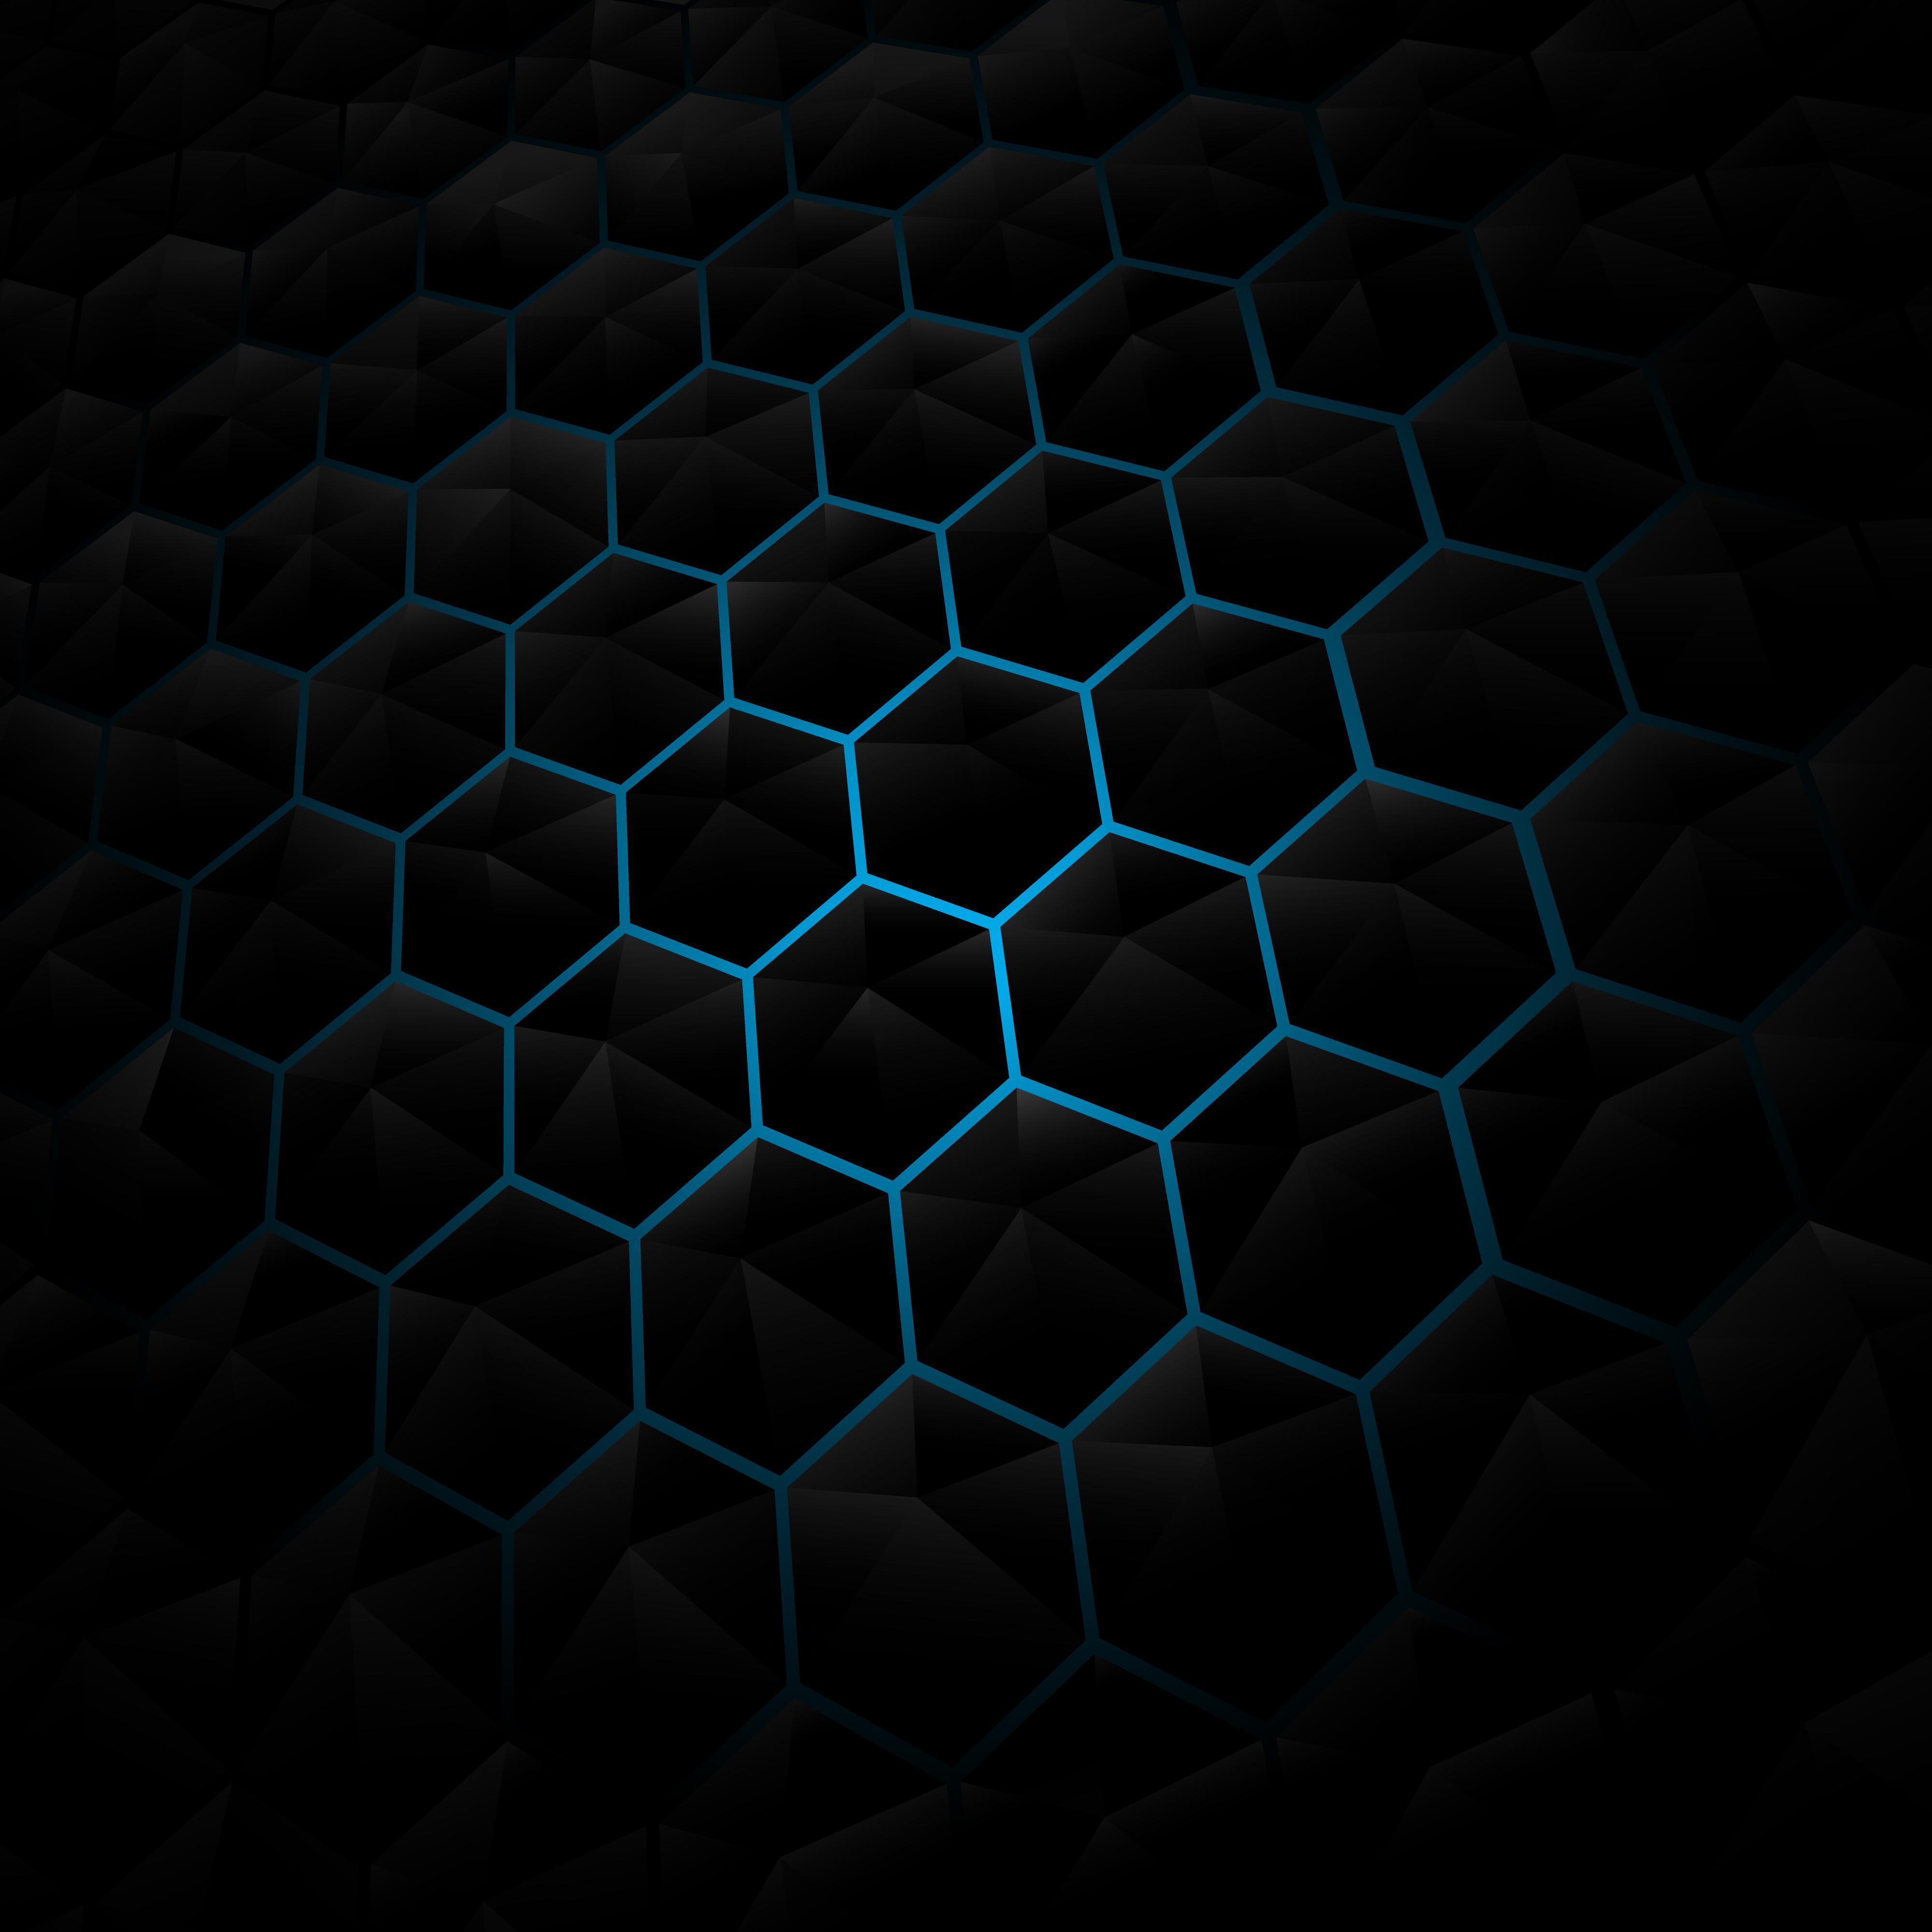 Abstract Black Hexagon Pattern Background Download Free Vectors Clipart Graphics Vector Art